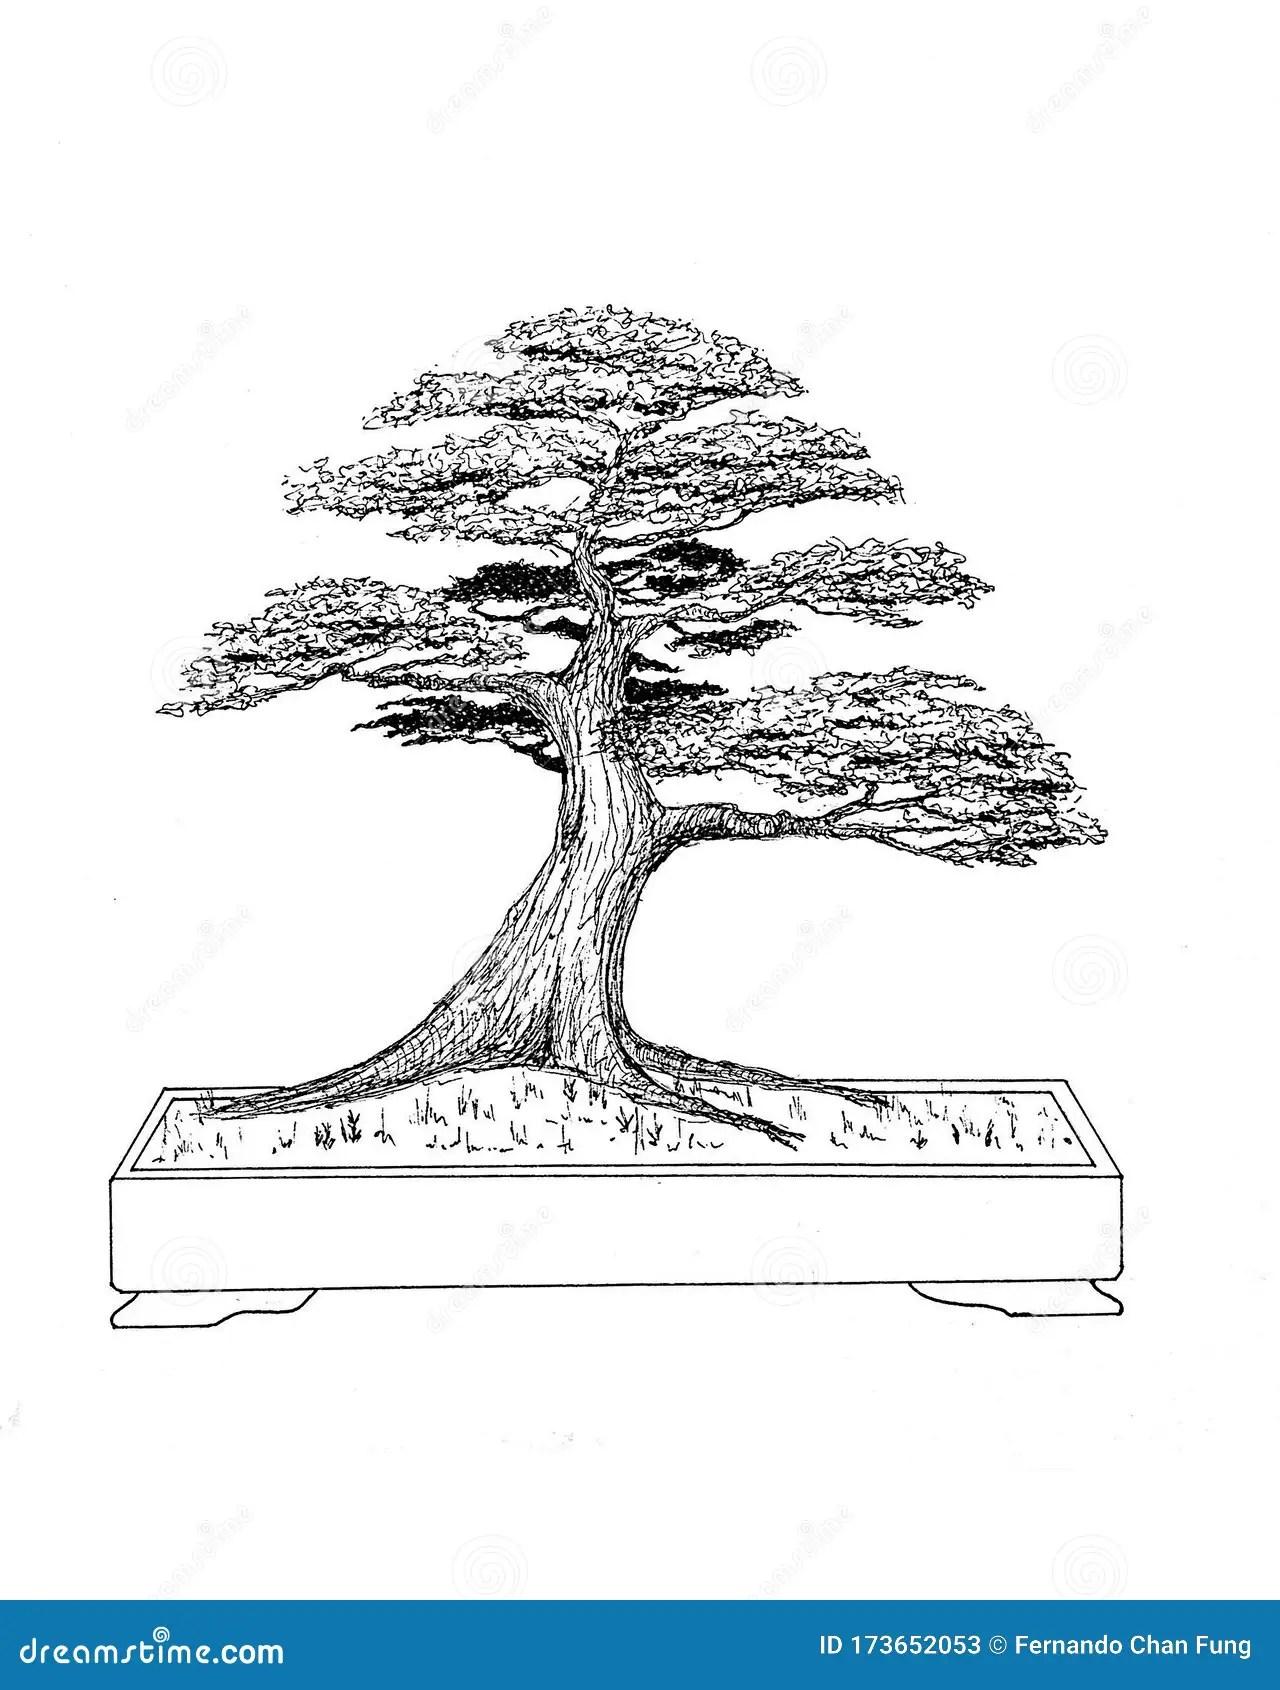 Bonsai Drawing : bonsai, drawing, Bonsai, Drawing, Arbol, Japan, China, Stock, Illustration, Tinta,, Fine:, 173652053